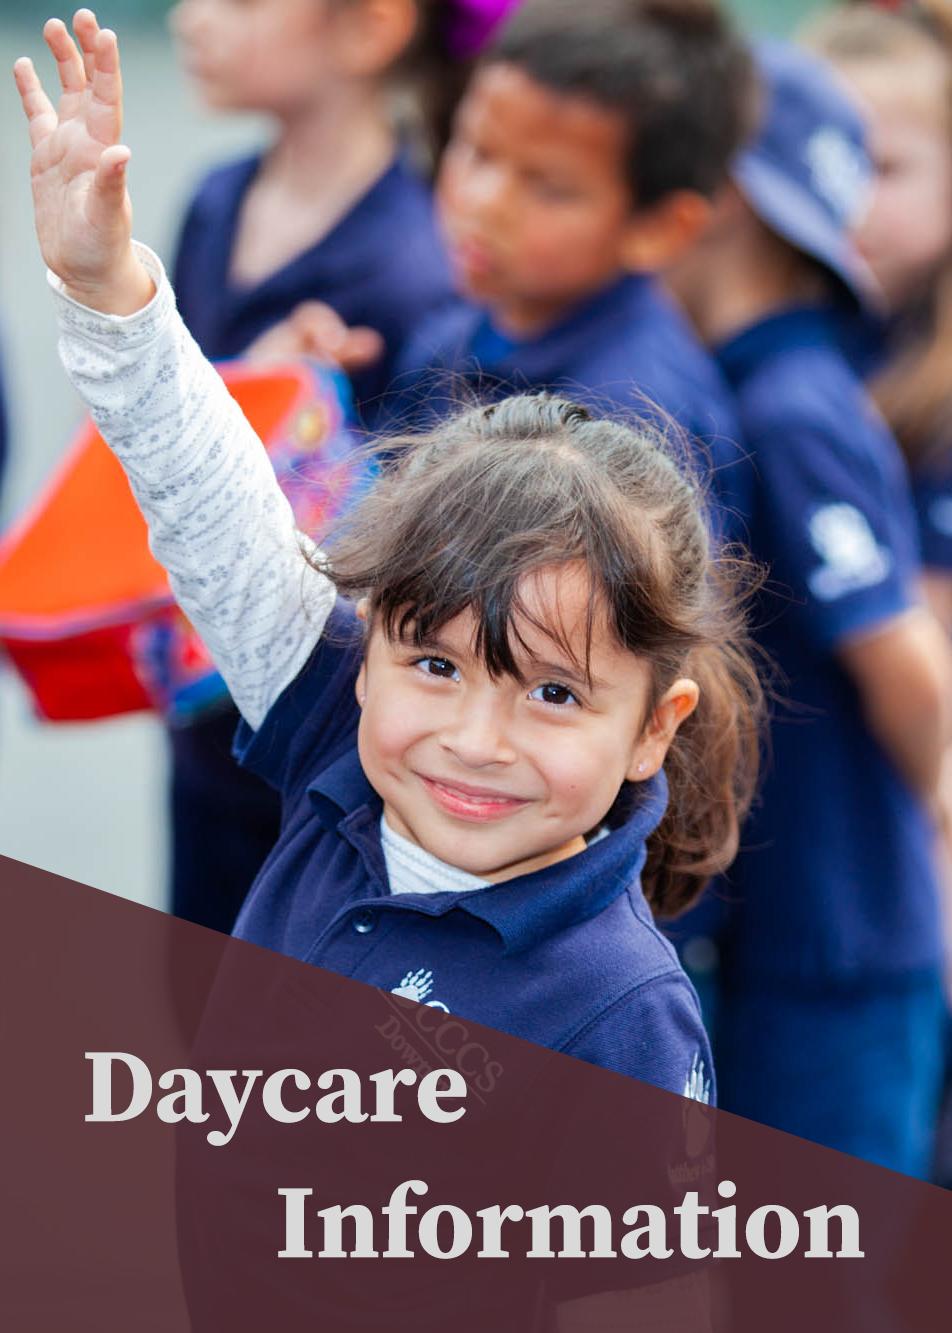 Daycare Information